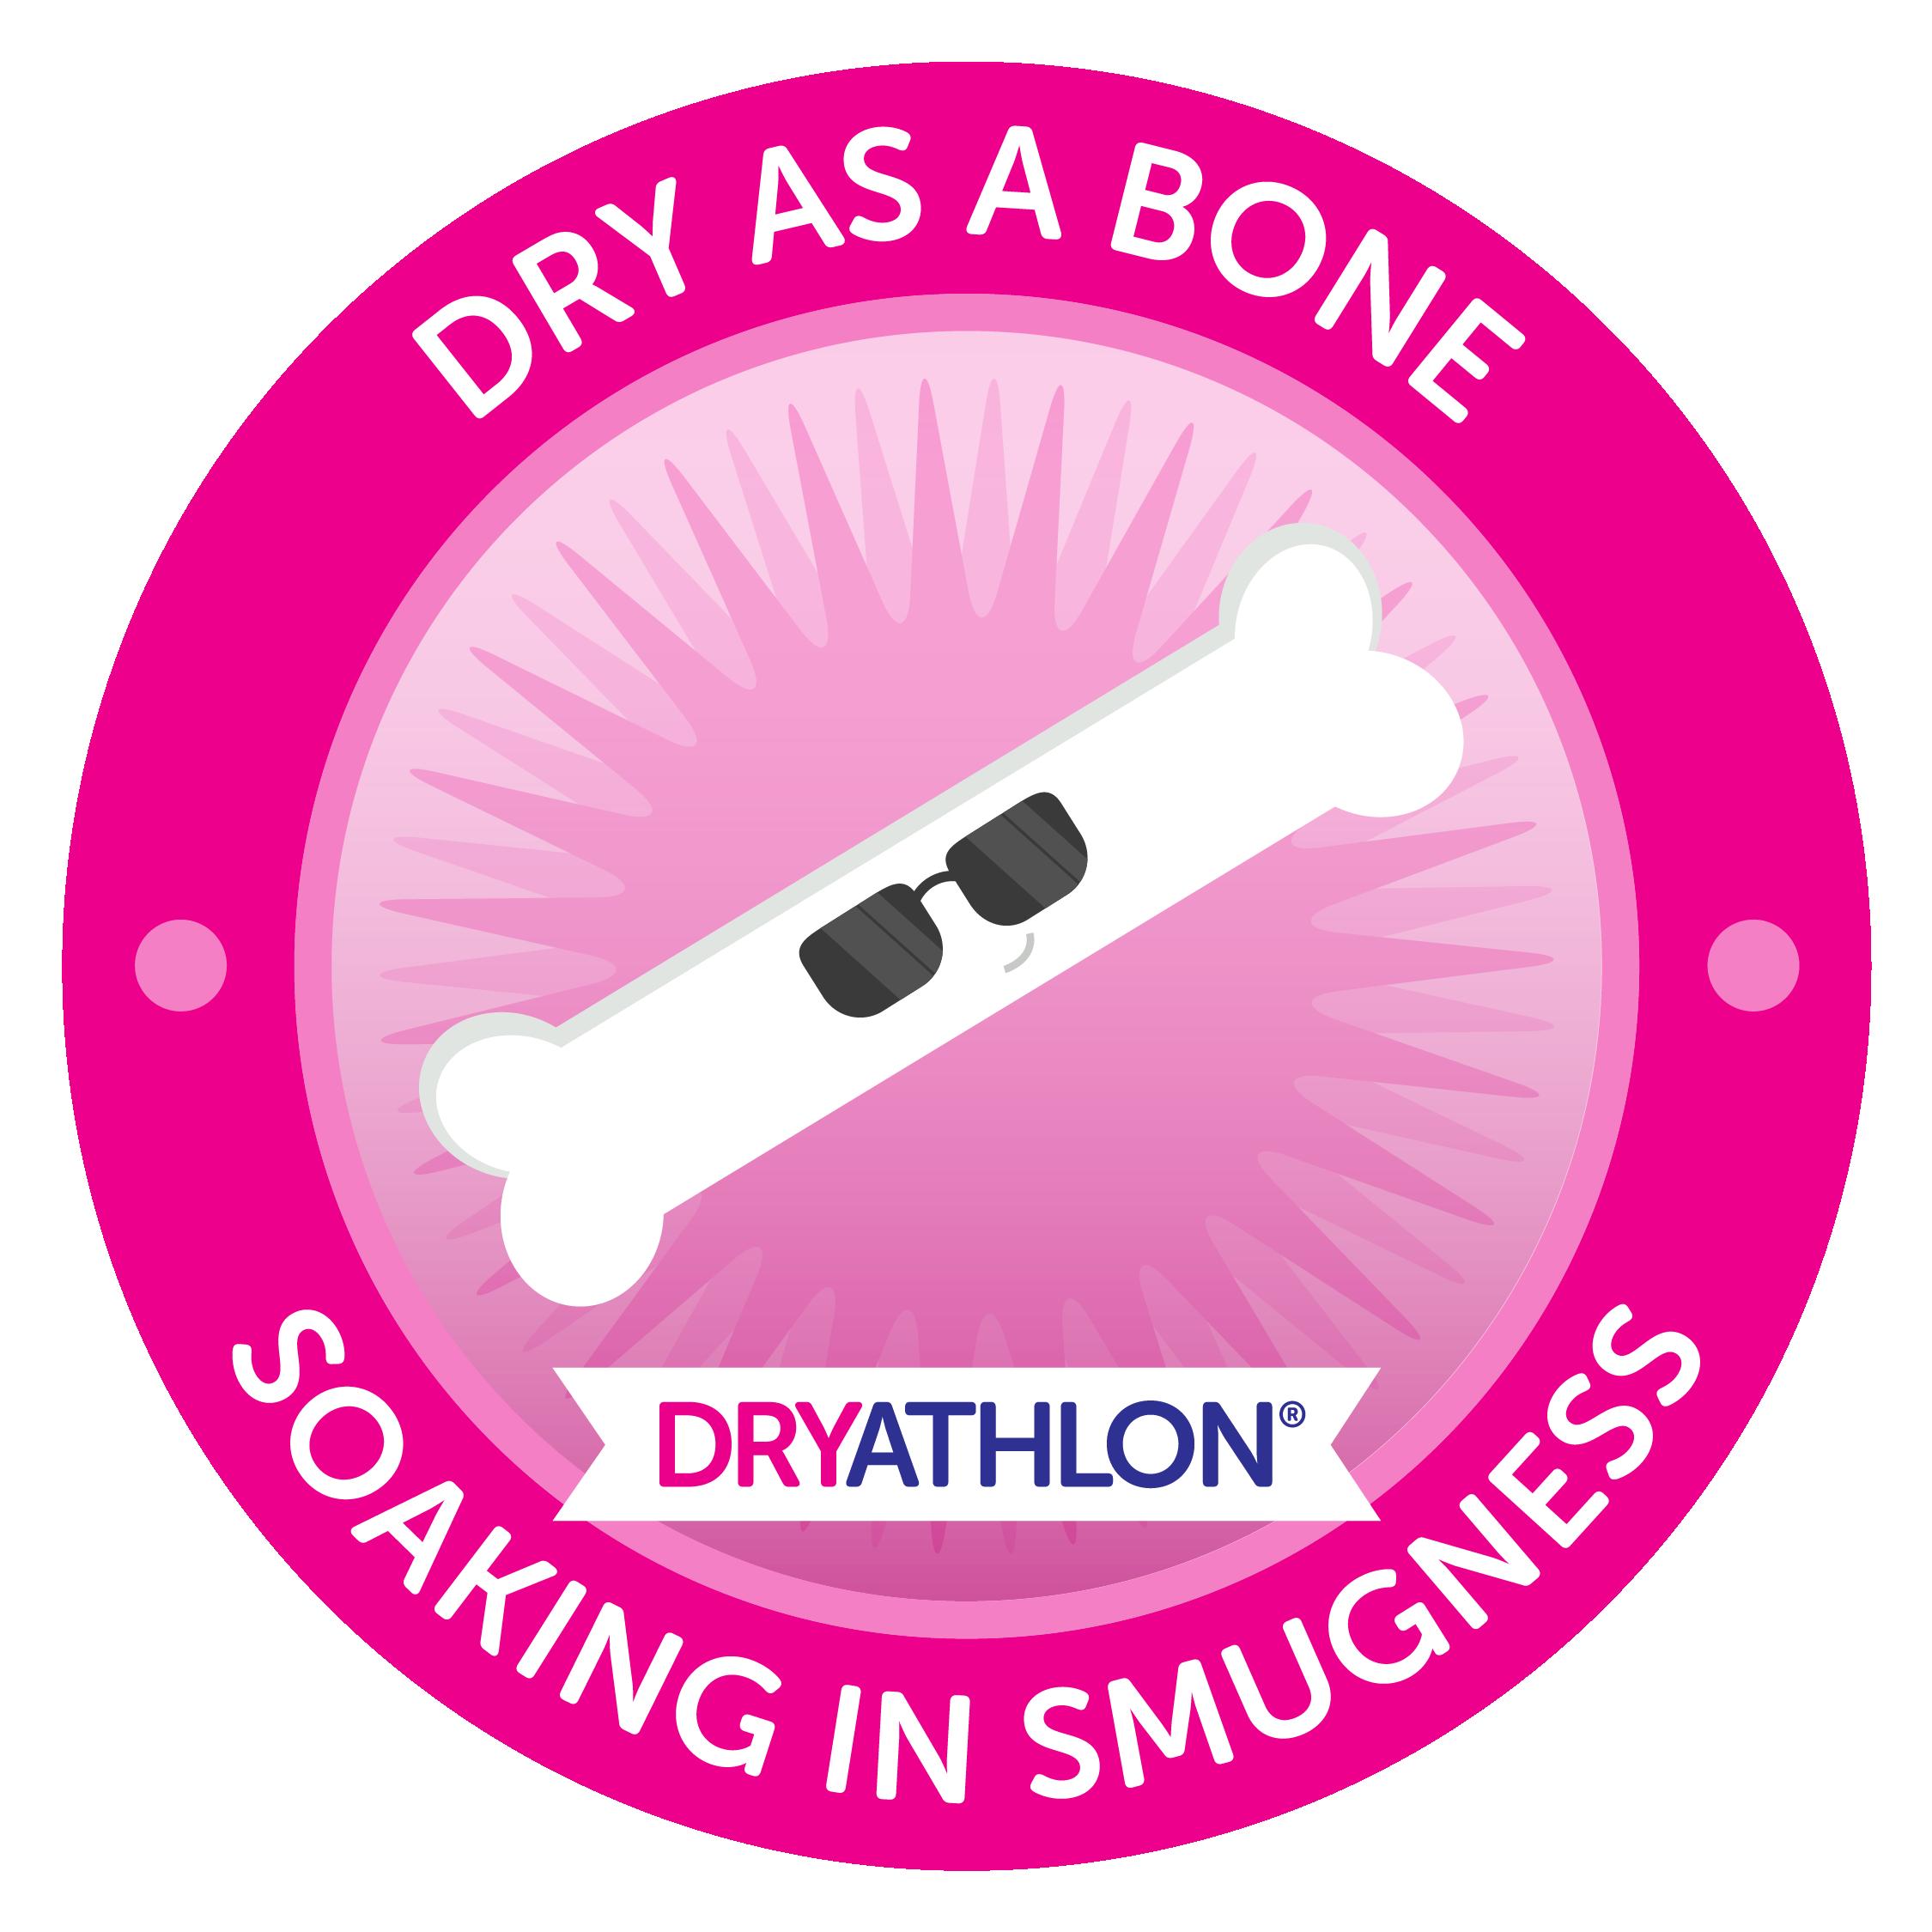 Dry as a bone badge